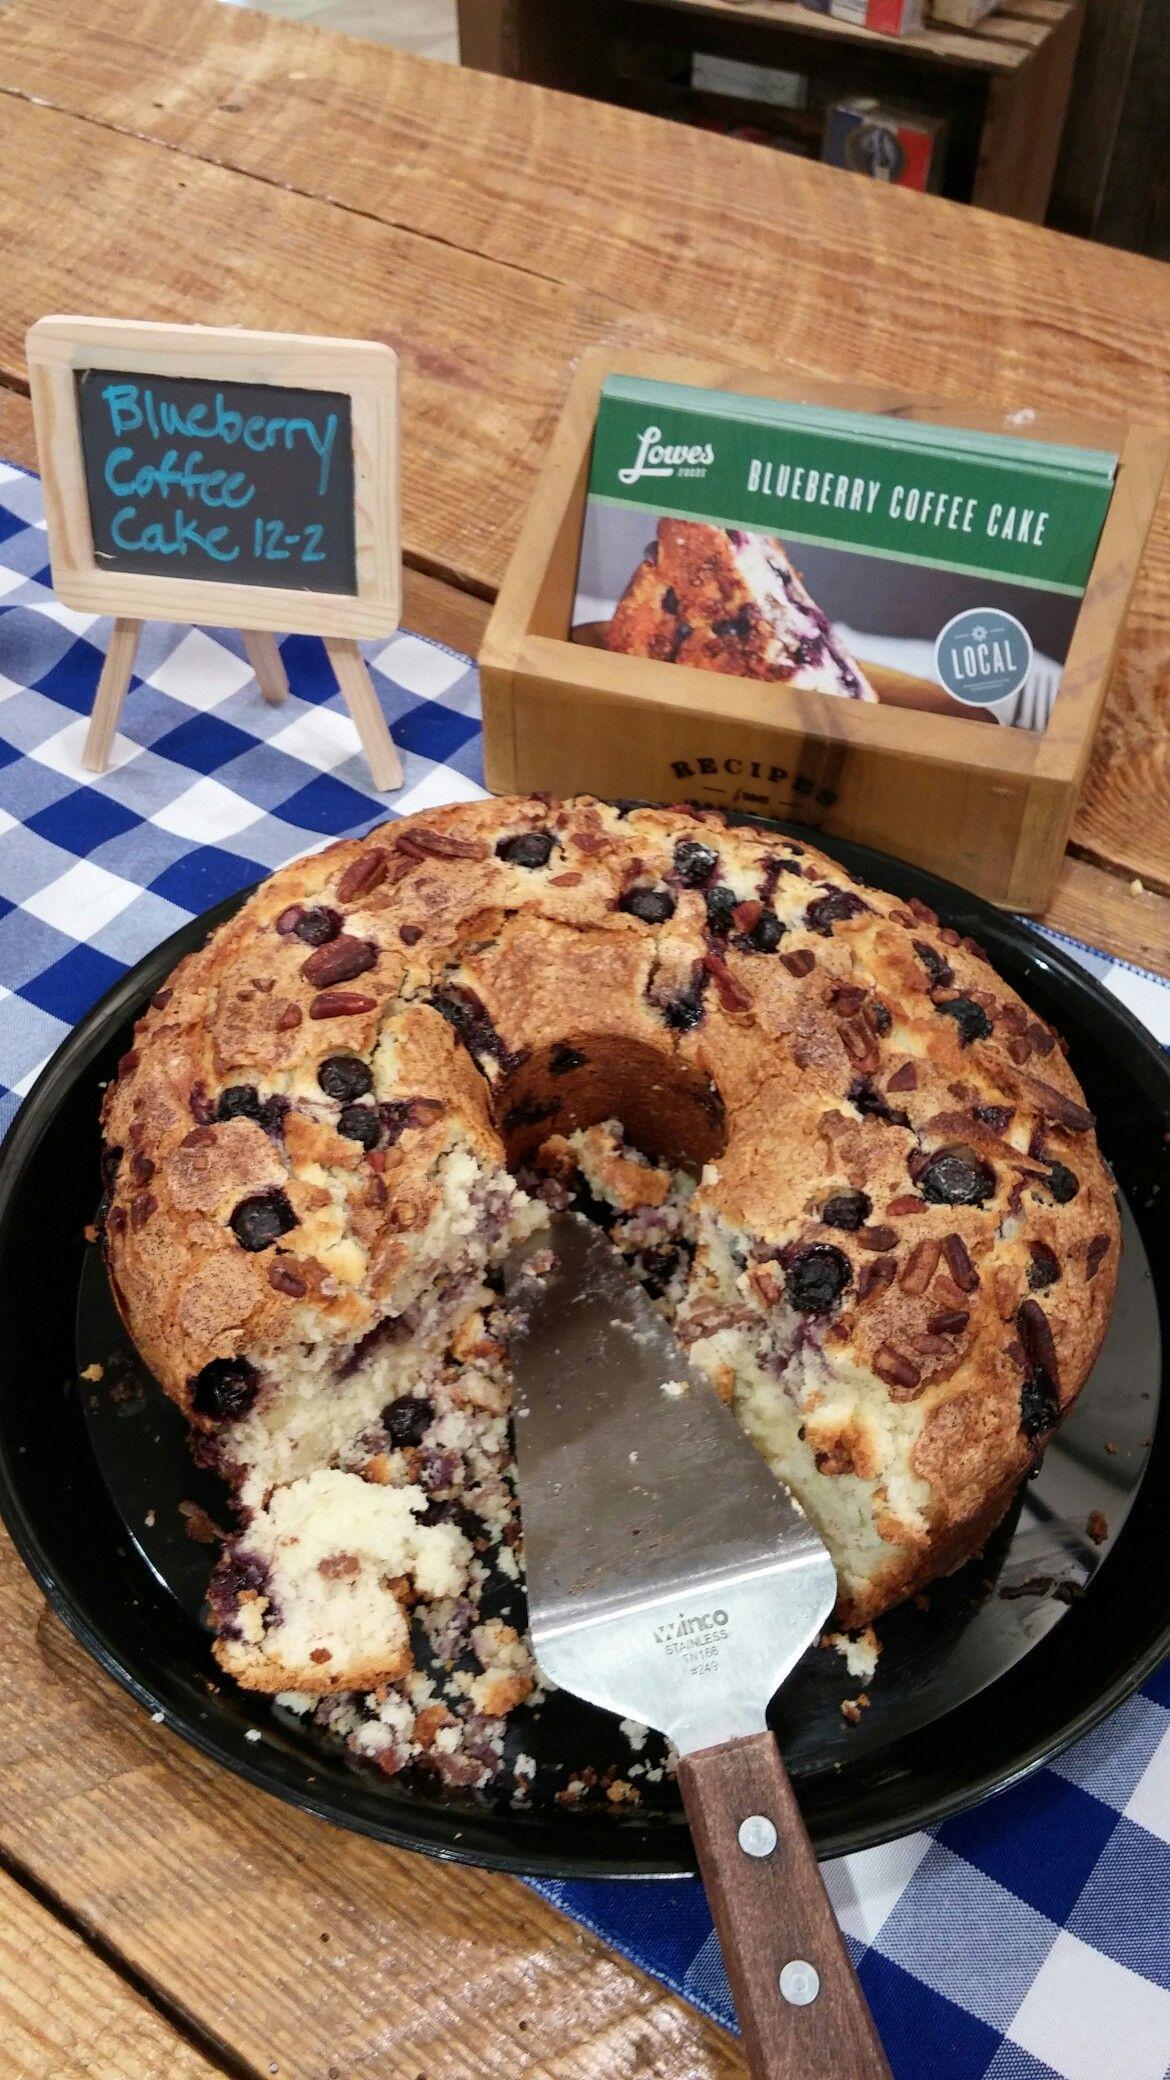 Best blueberry coffee cake recipeit definitely made it